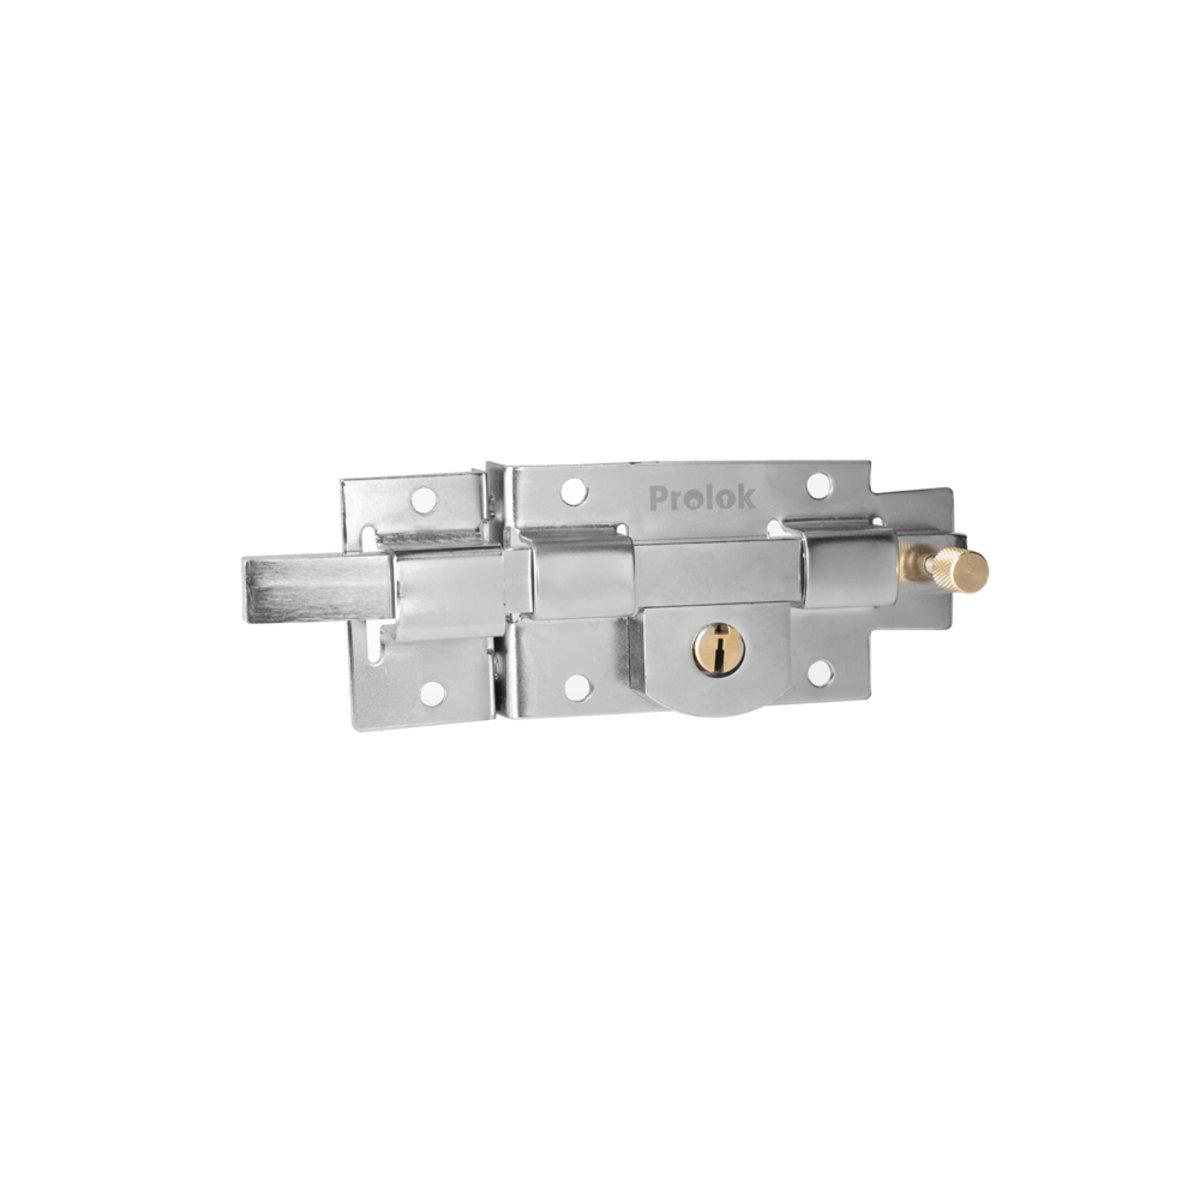 Cerradura barra fija derecha Soldable Laton Solido Prolok